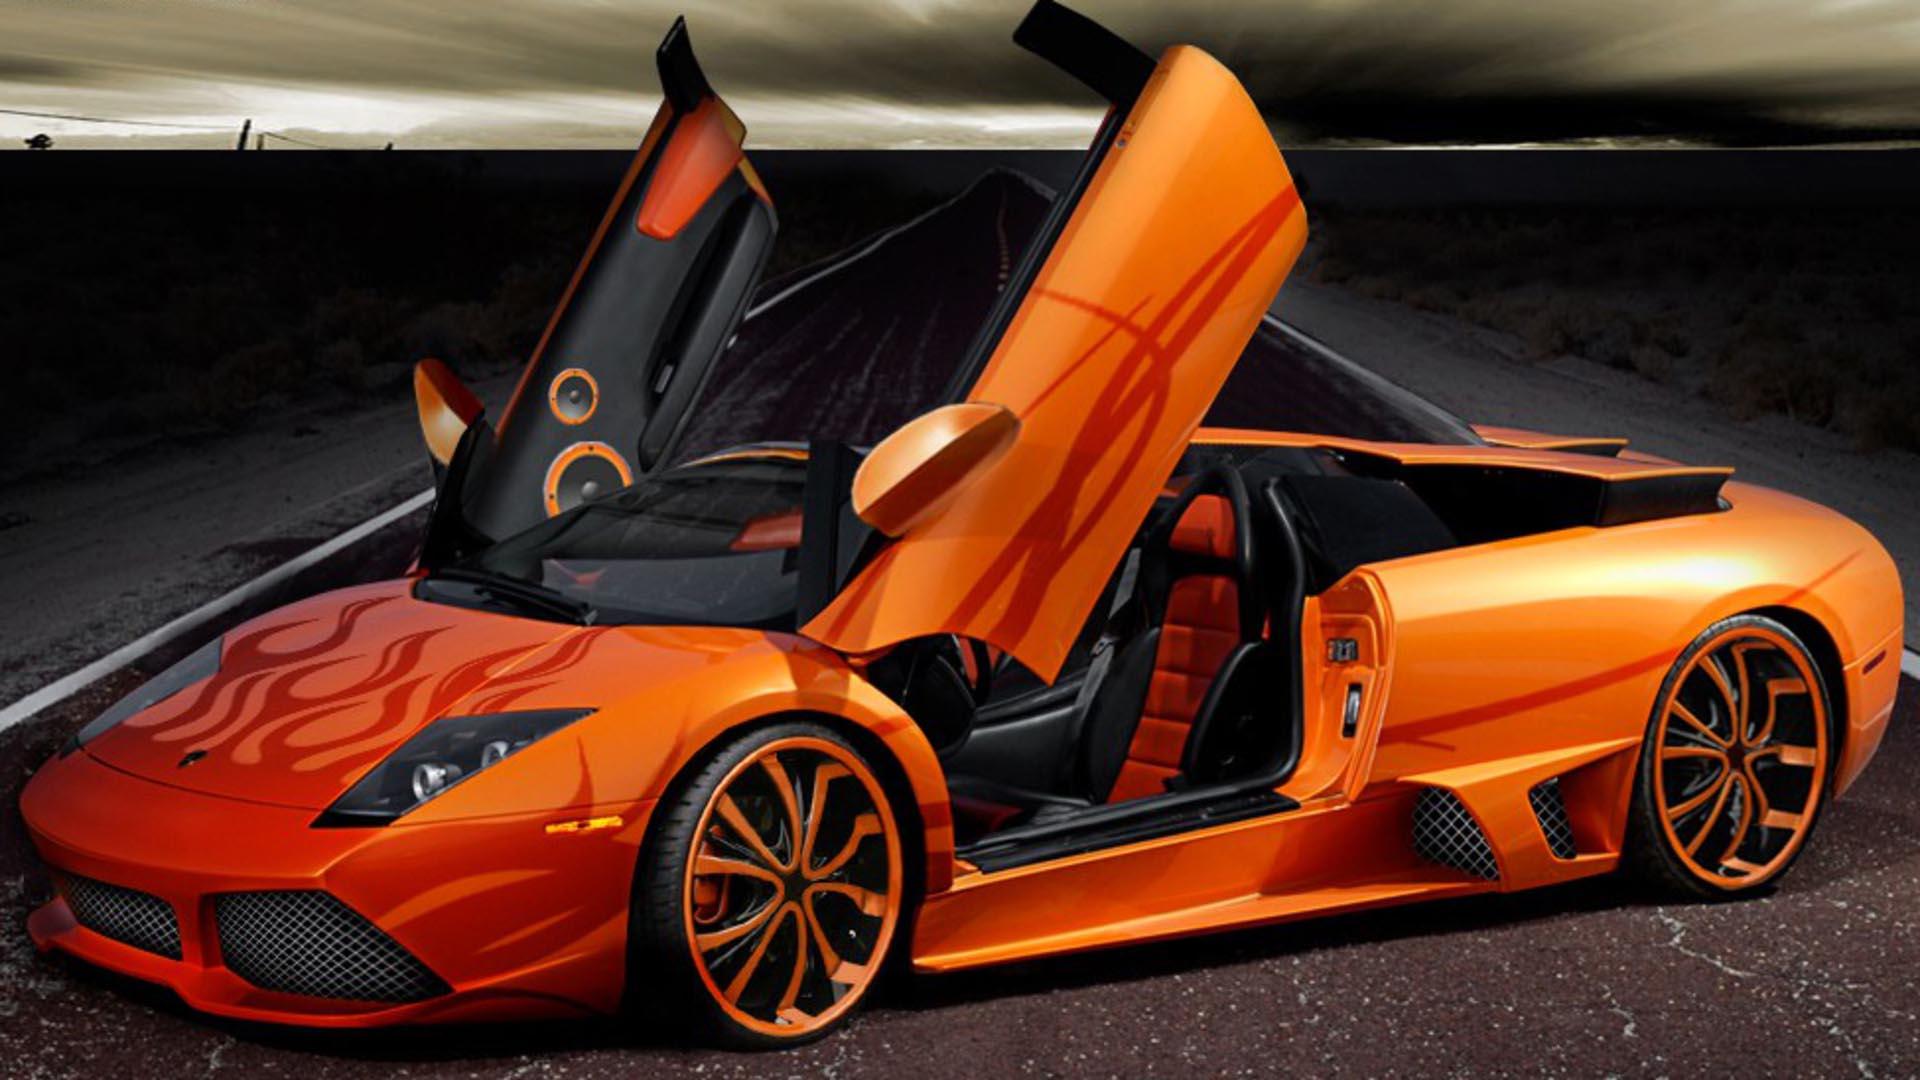 Nice Full Hd Lamborghini Wallpape Nice Lamborghini 1920x1080 Wallpaper Teahub Io